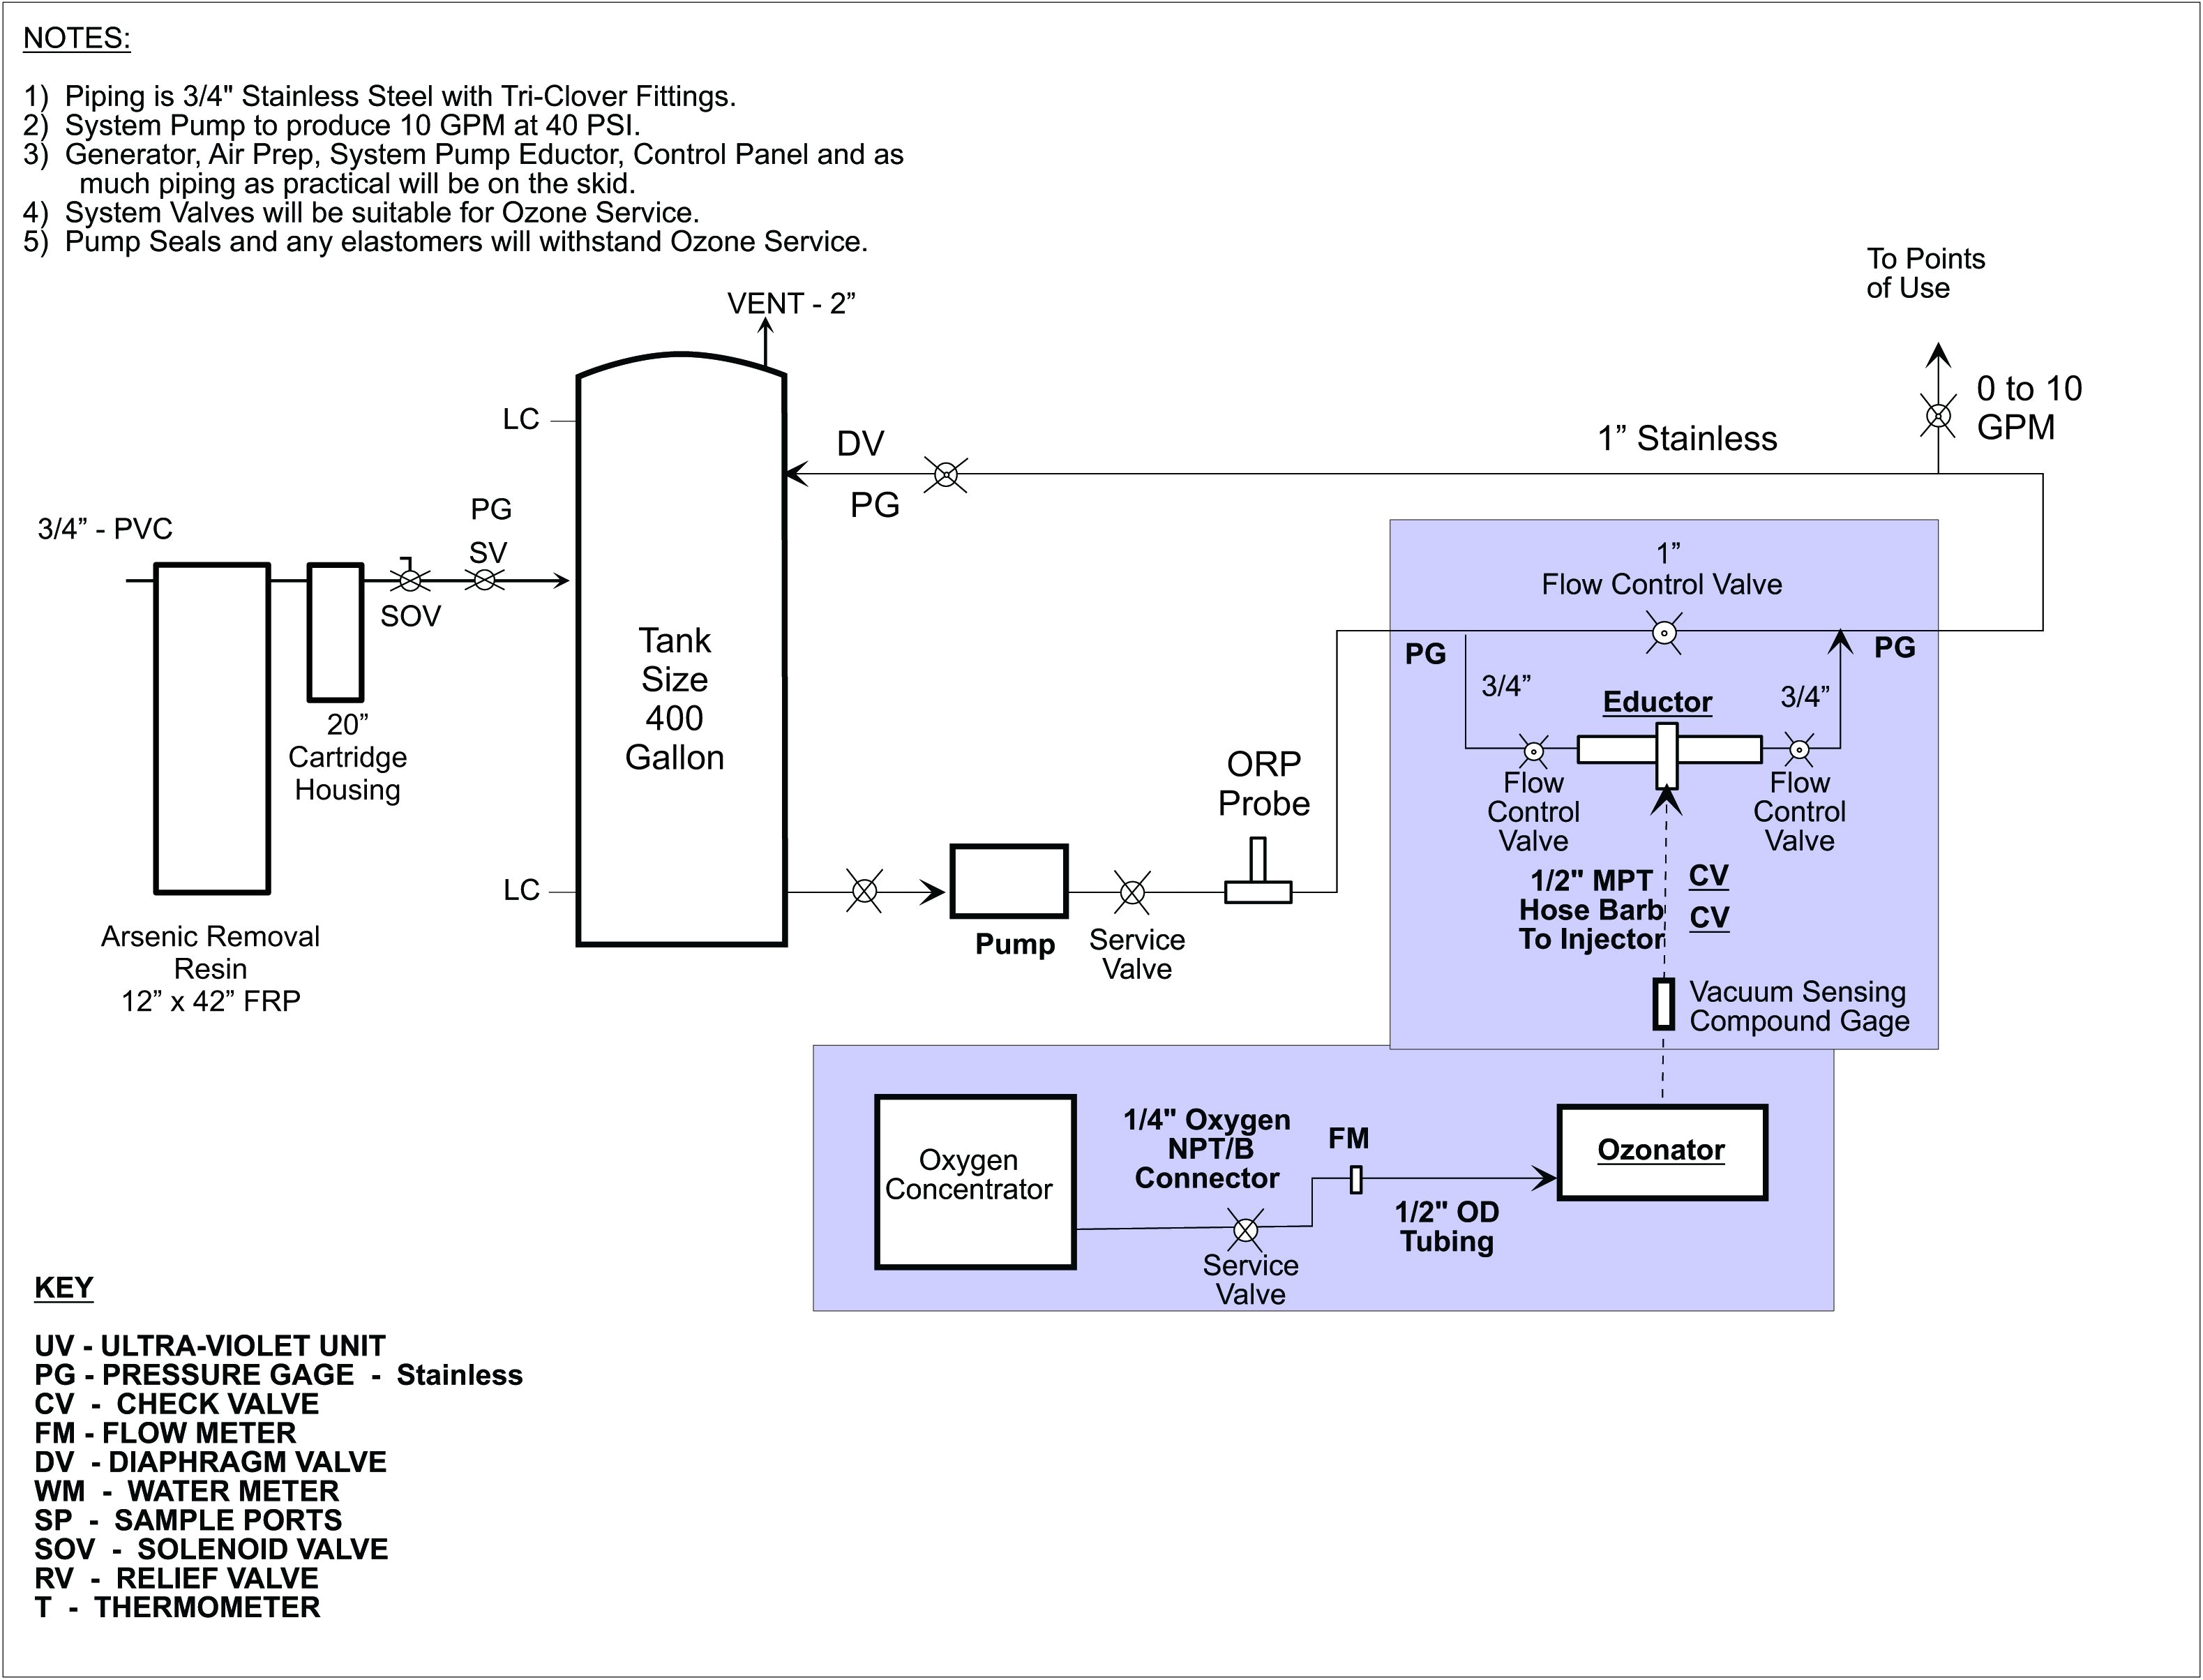 ammeter for prlntedcircuit wiring circuit diagram tradeoficcom soldering iron control circuit diagram tradeoficcom book diagram ammeter